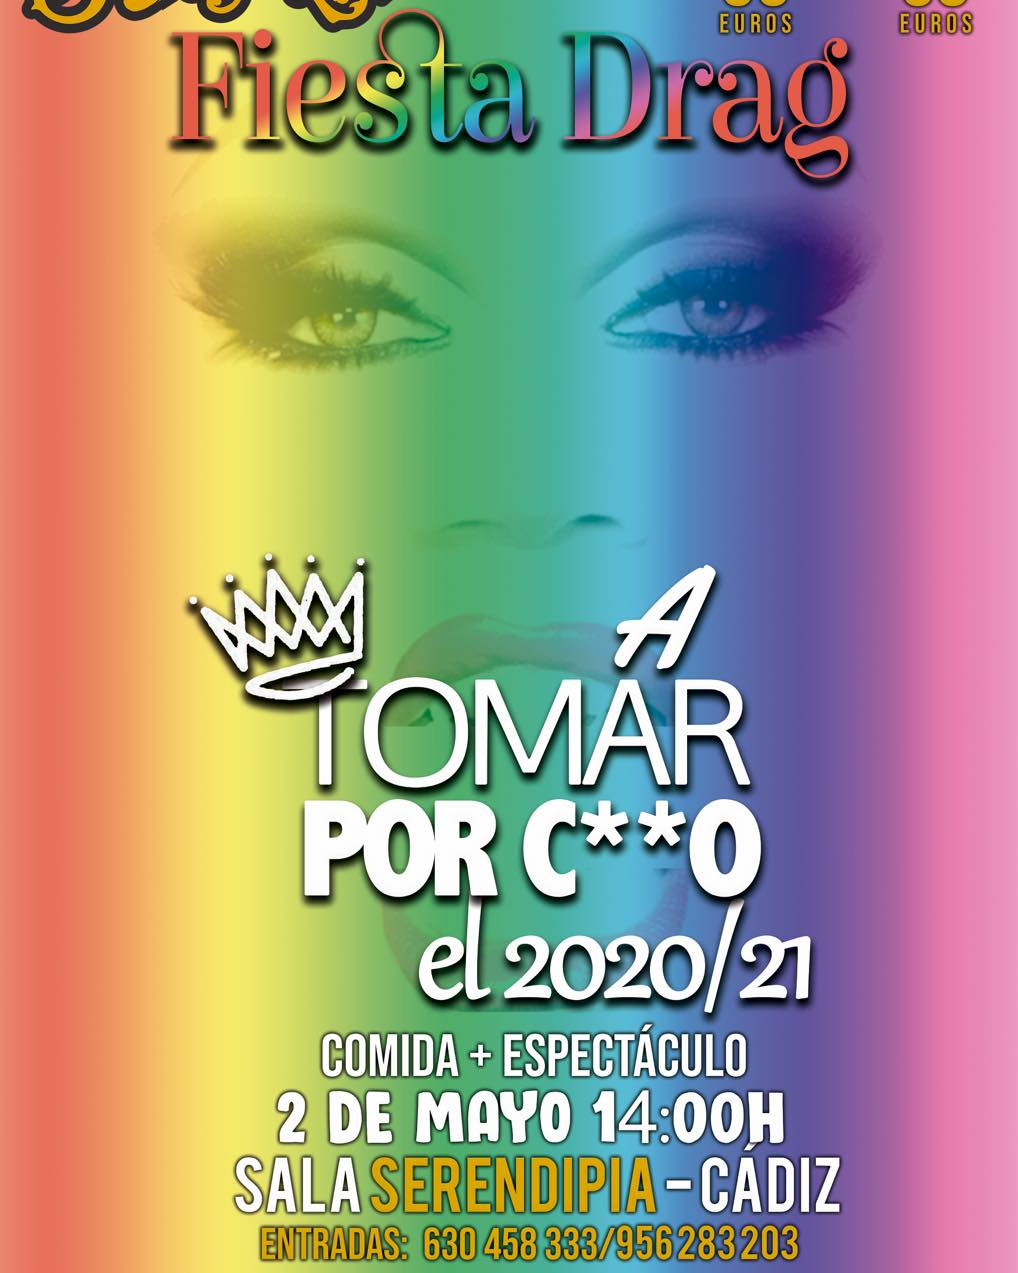 Fiesta Drag Queen - Comida + Espectáculo en Serendipia